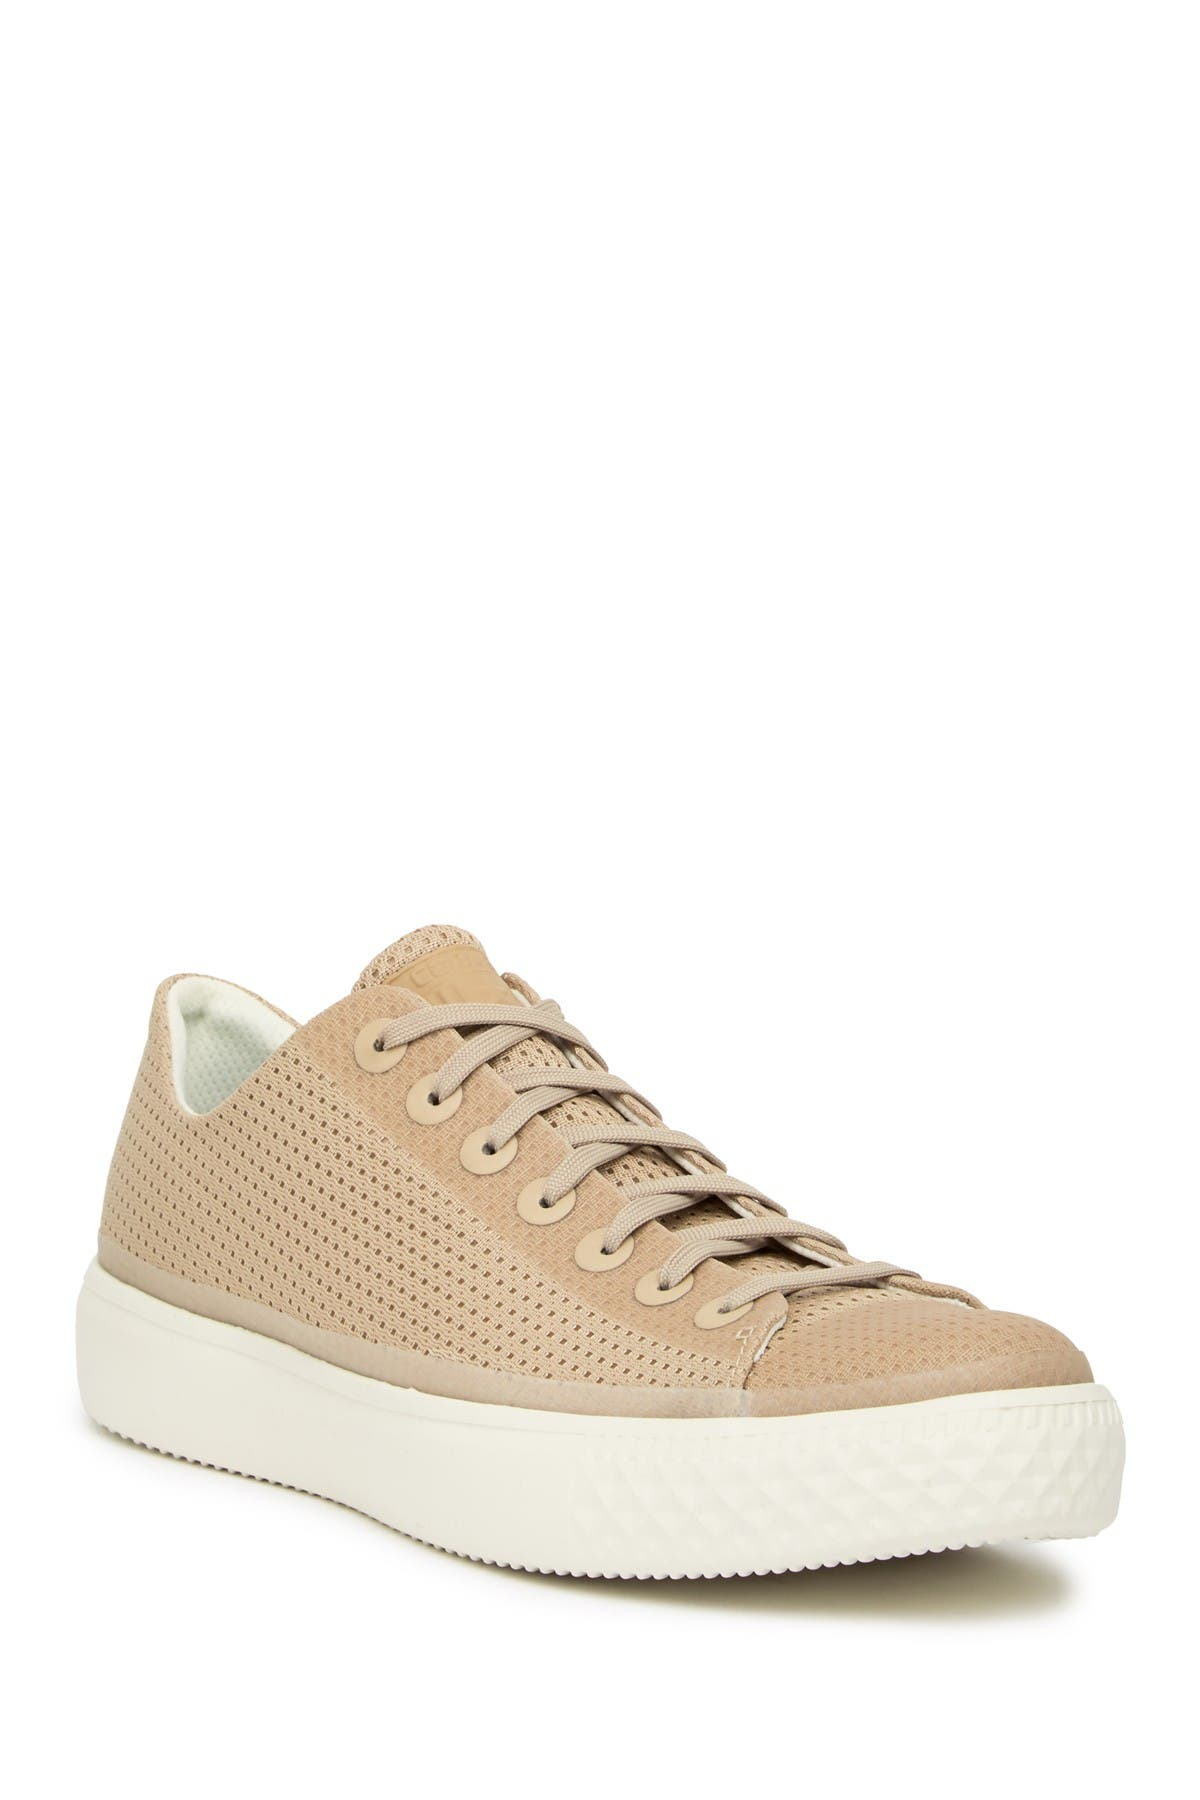 Converse | Modern Oxford Sneaker